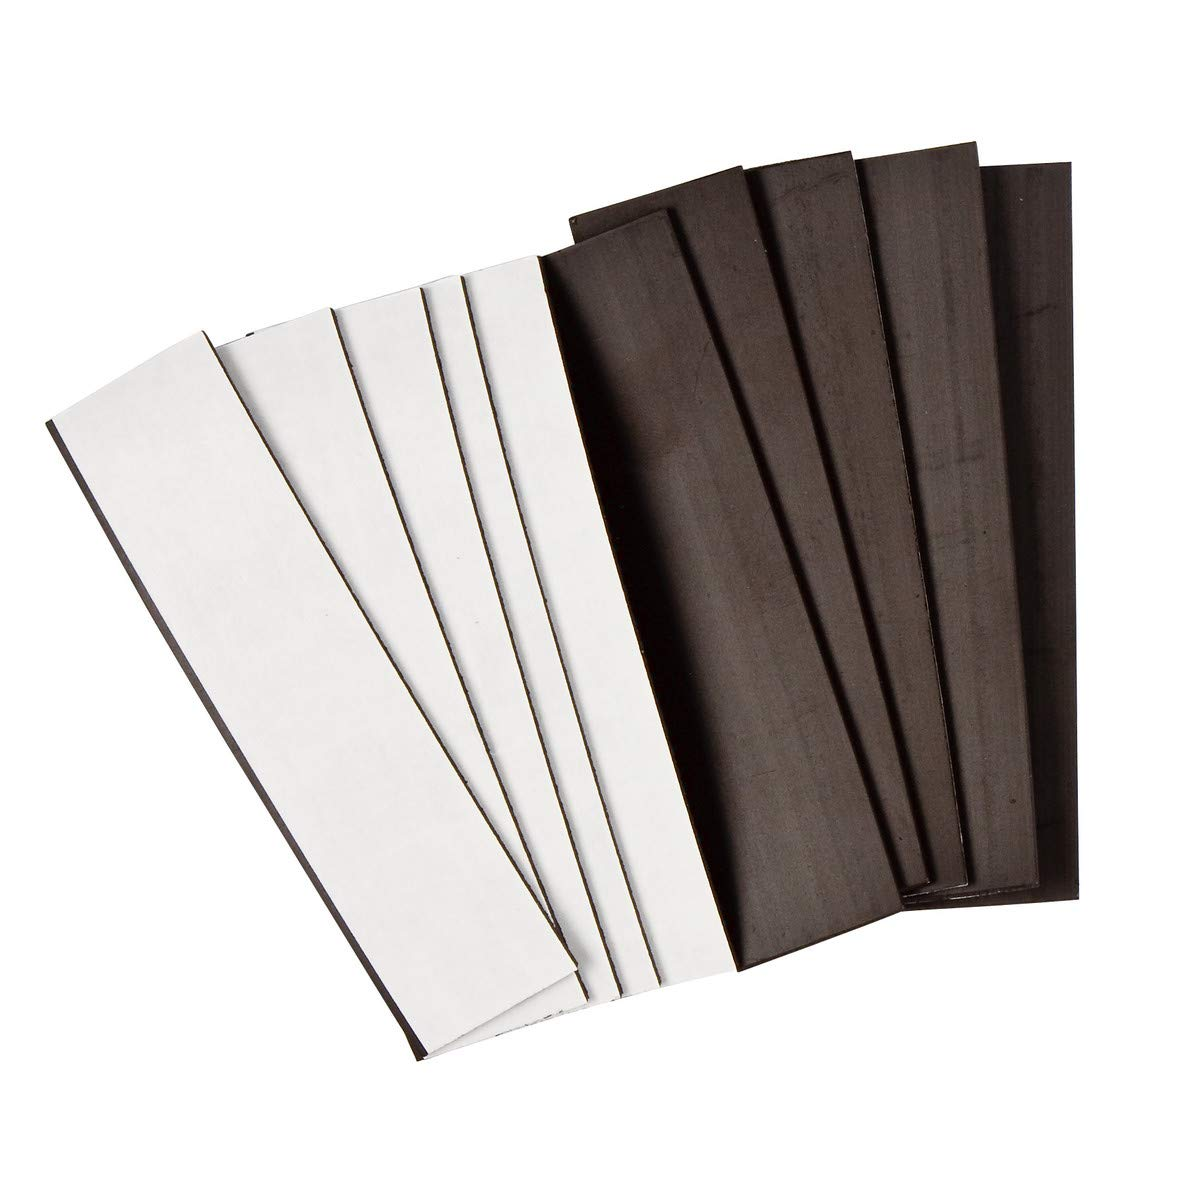 Brady 4'' X .0625'' White Magnet Strips by Brady USA (Image #1)